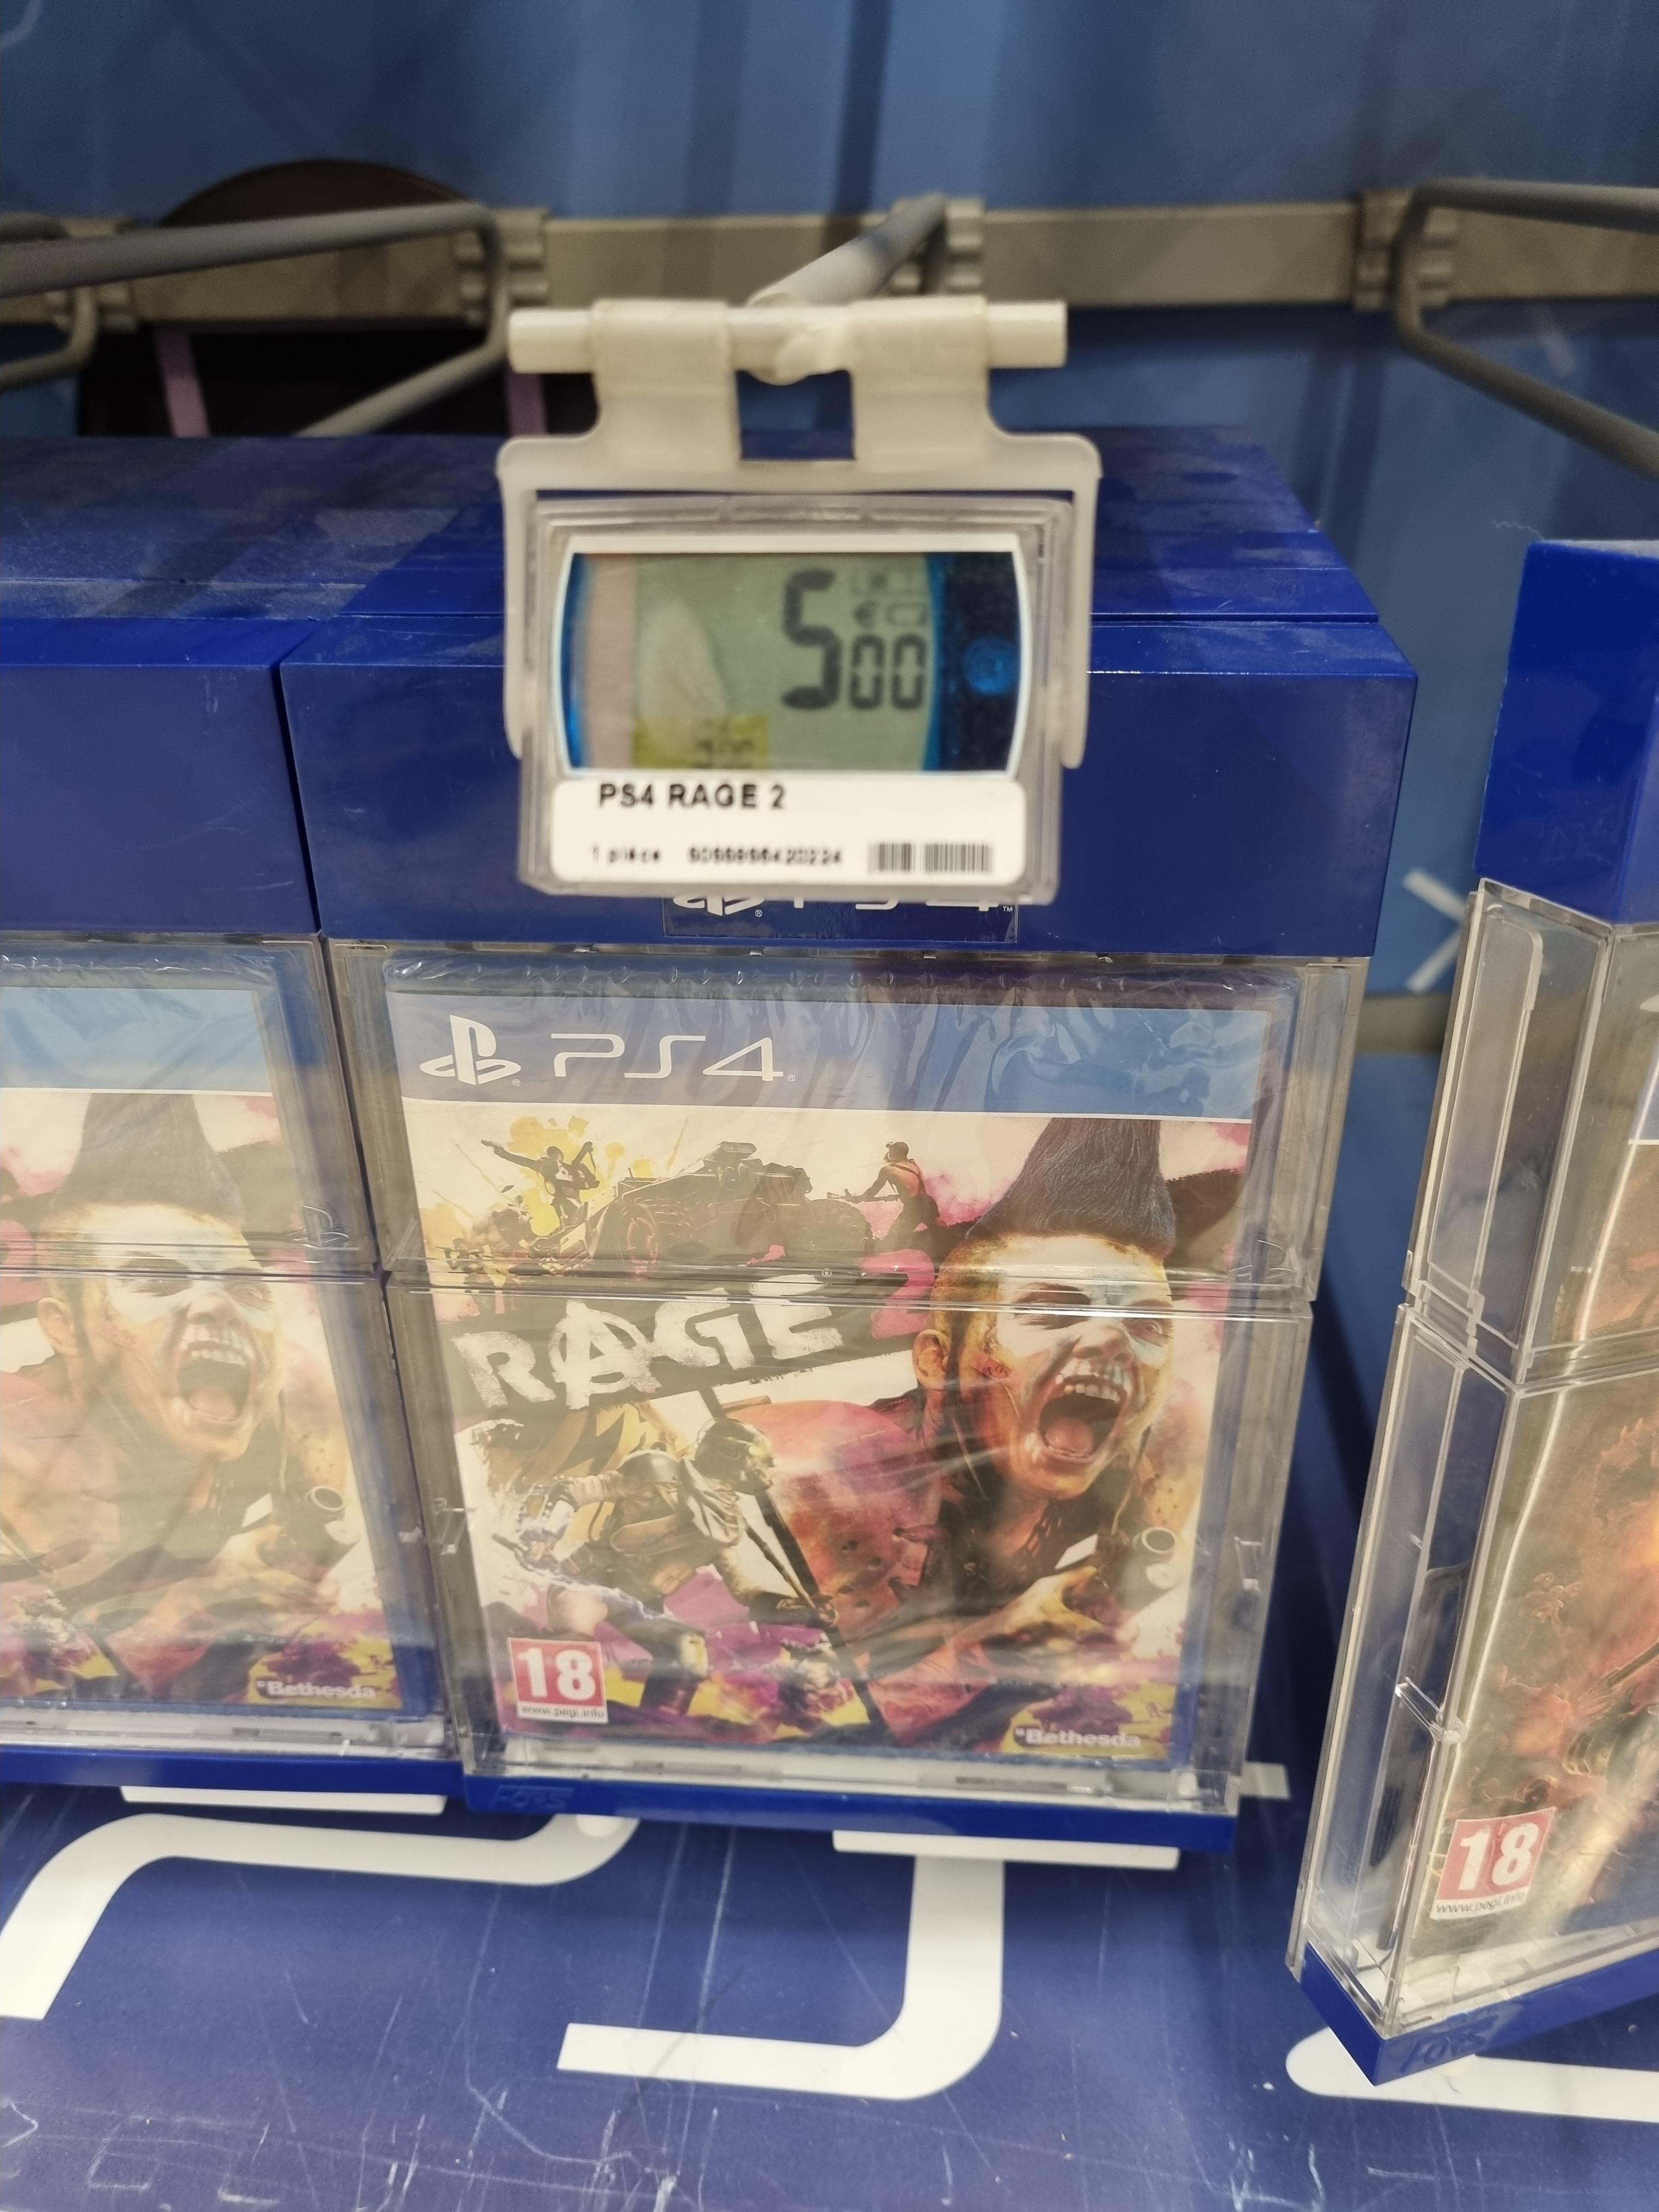 Jeu Rage 2 sur PS4 - Nantes (44)